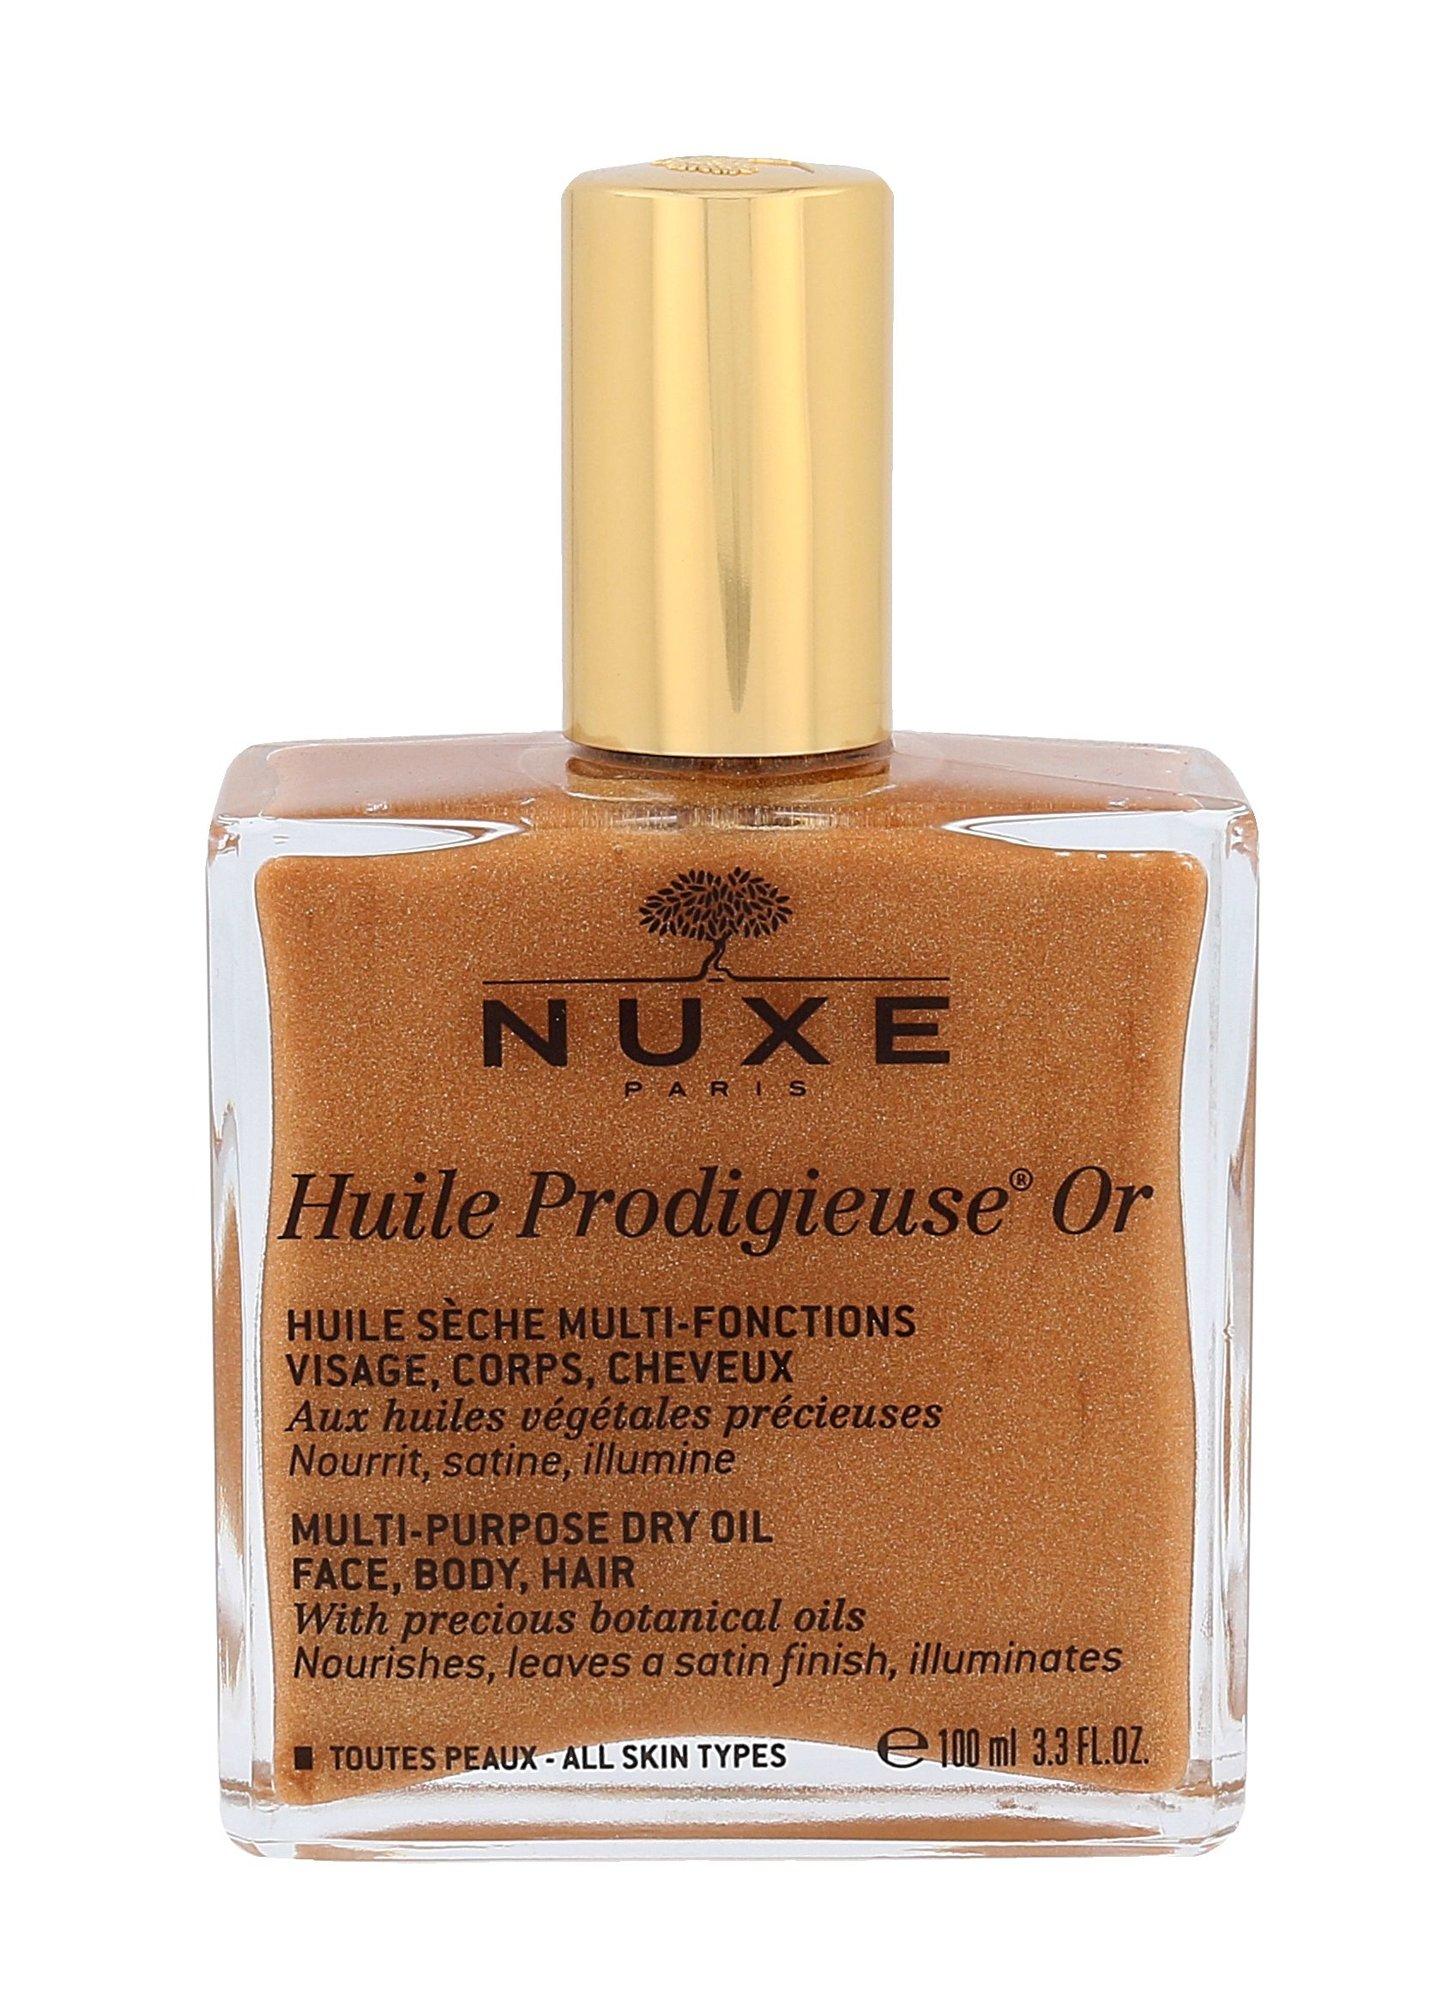 NUXE Huile Prodigieuse Or Cosmetic 100ml